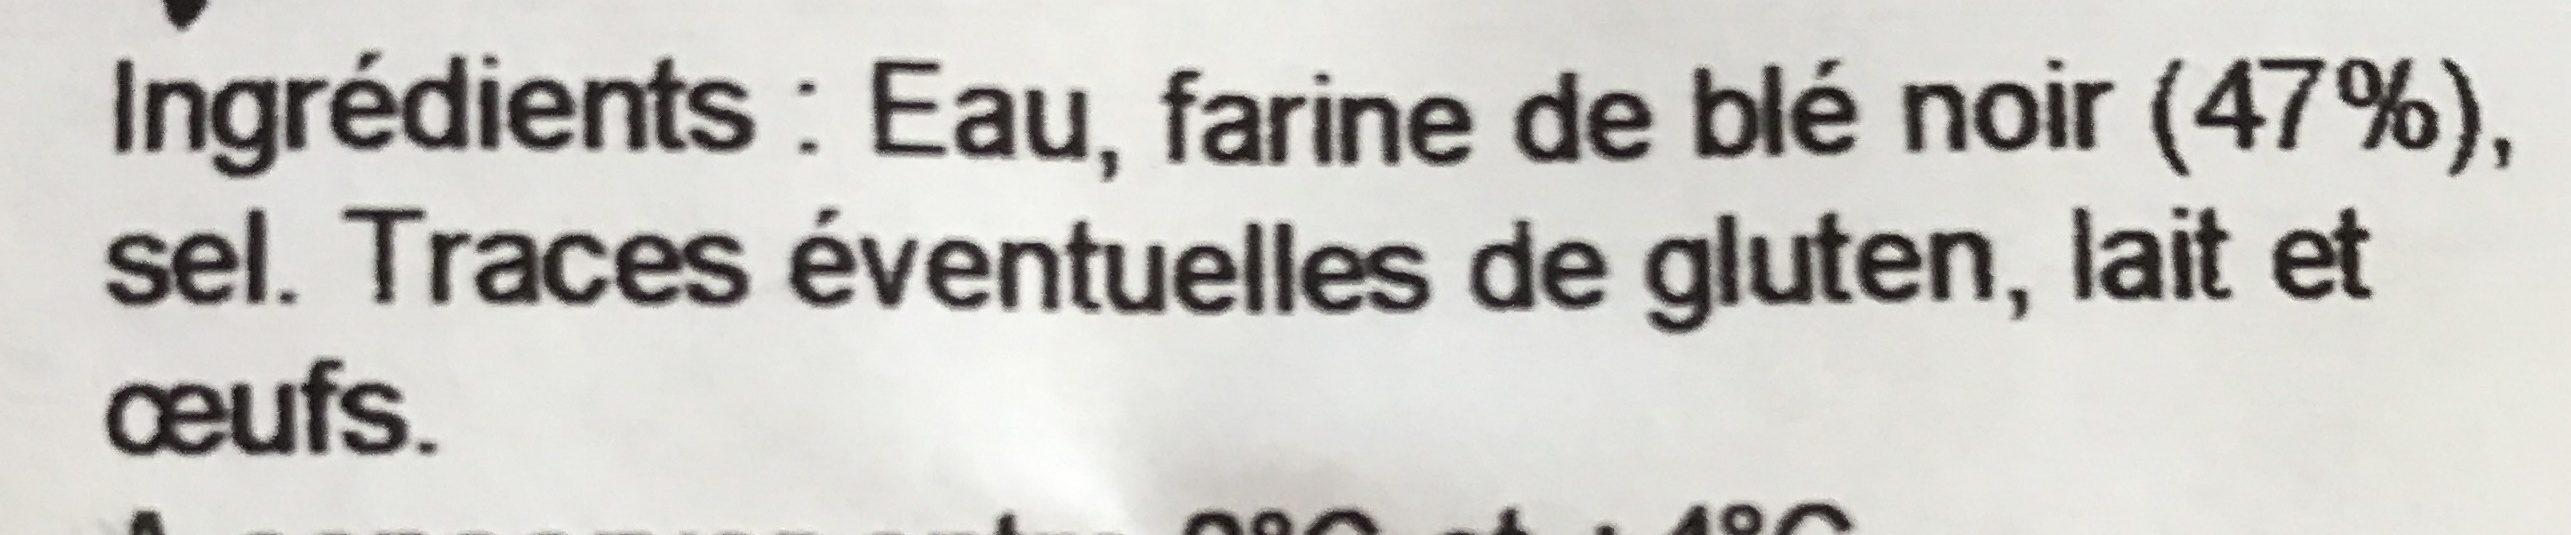 4 Galettes de Blé Noir - Ingrediënten